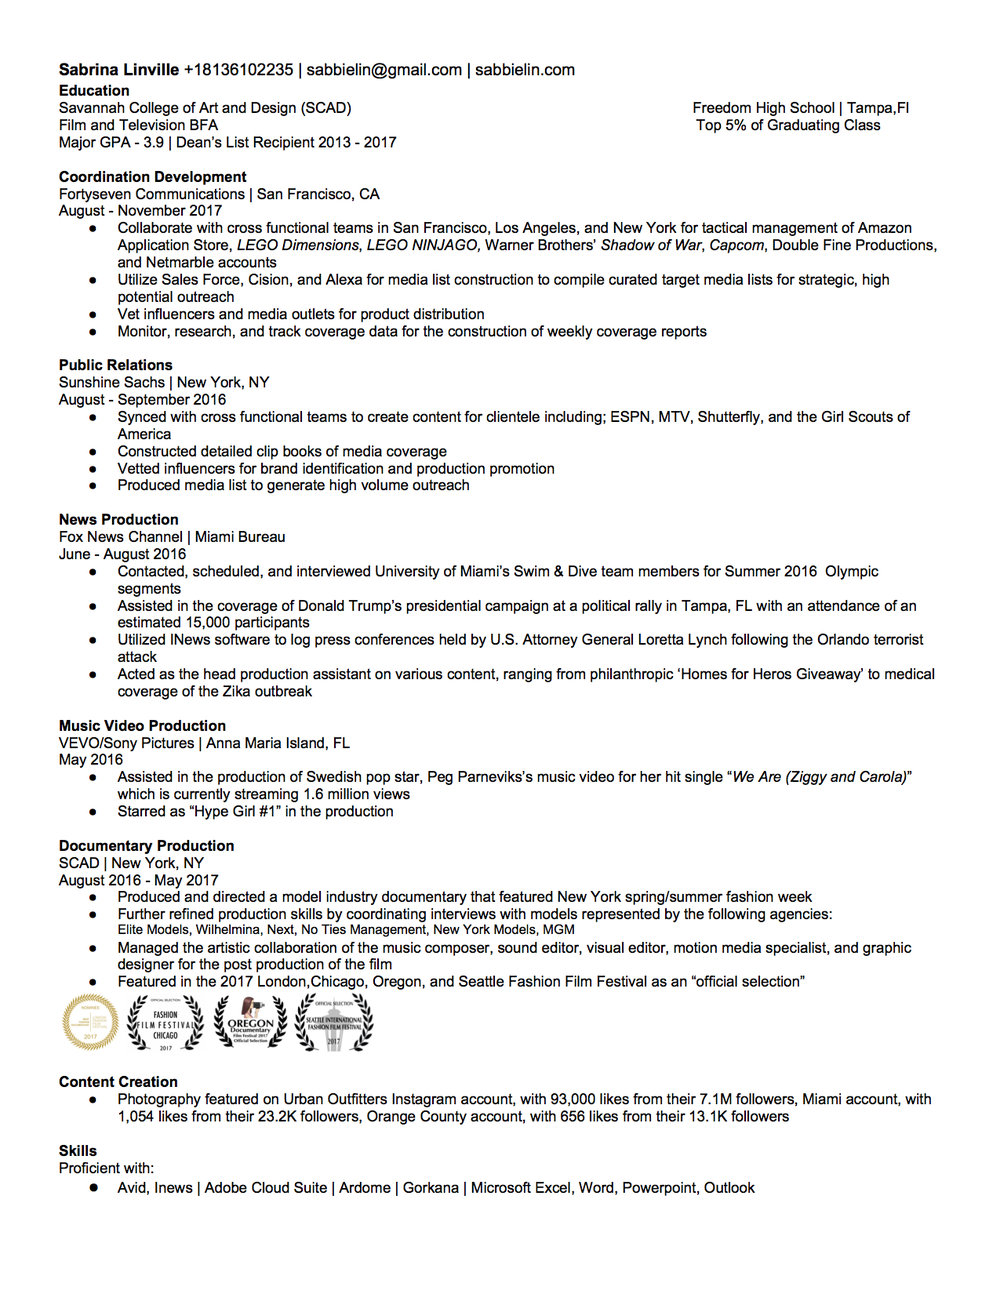 Resume — sabrina linville